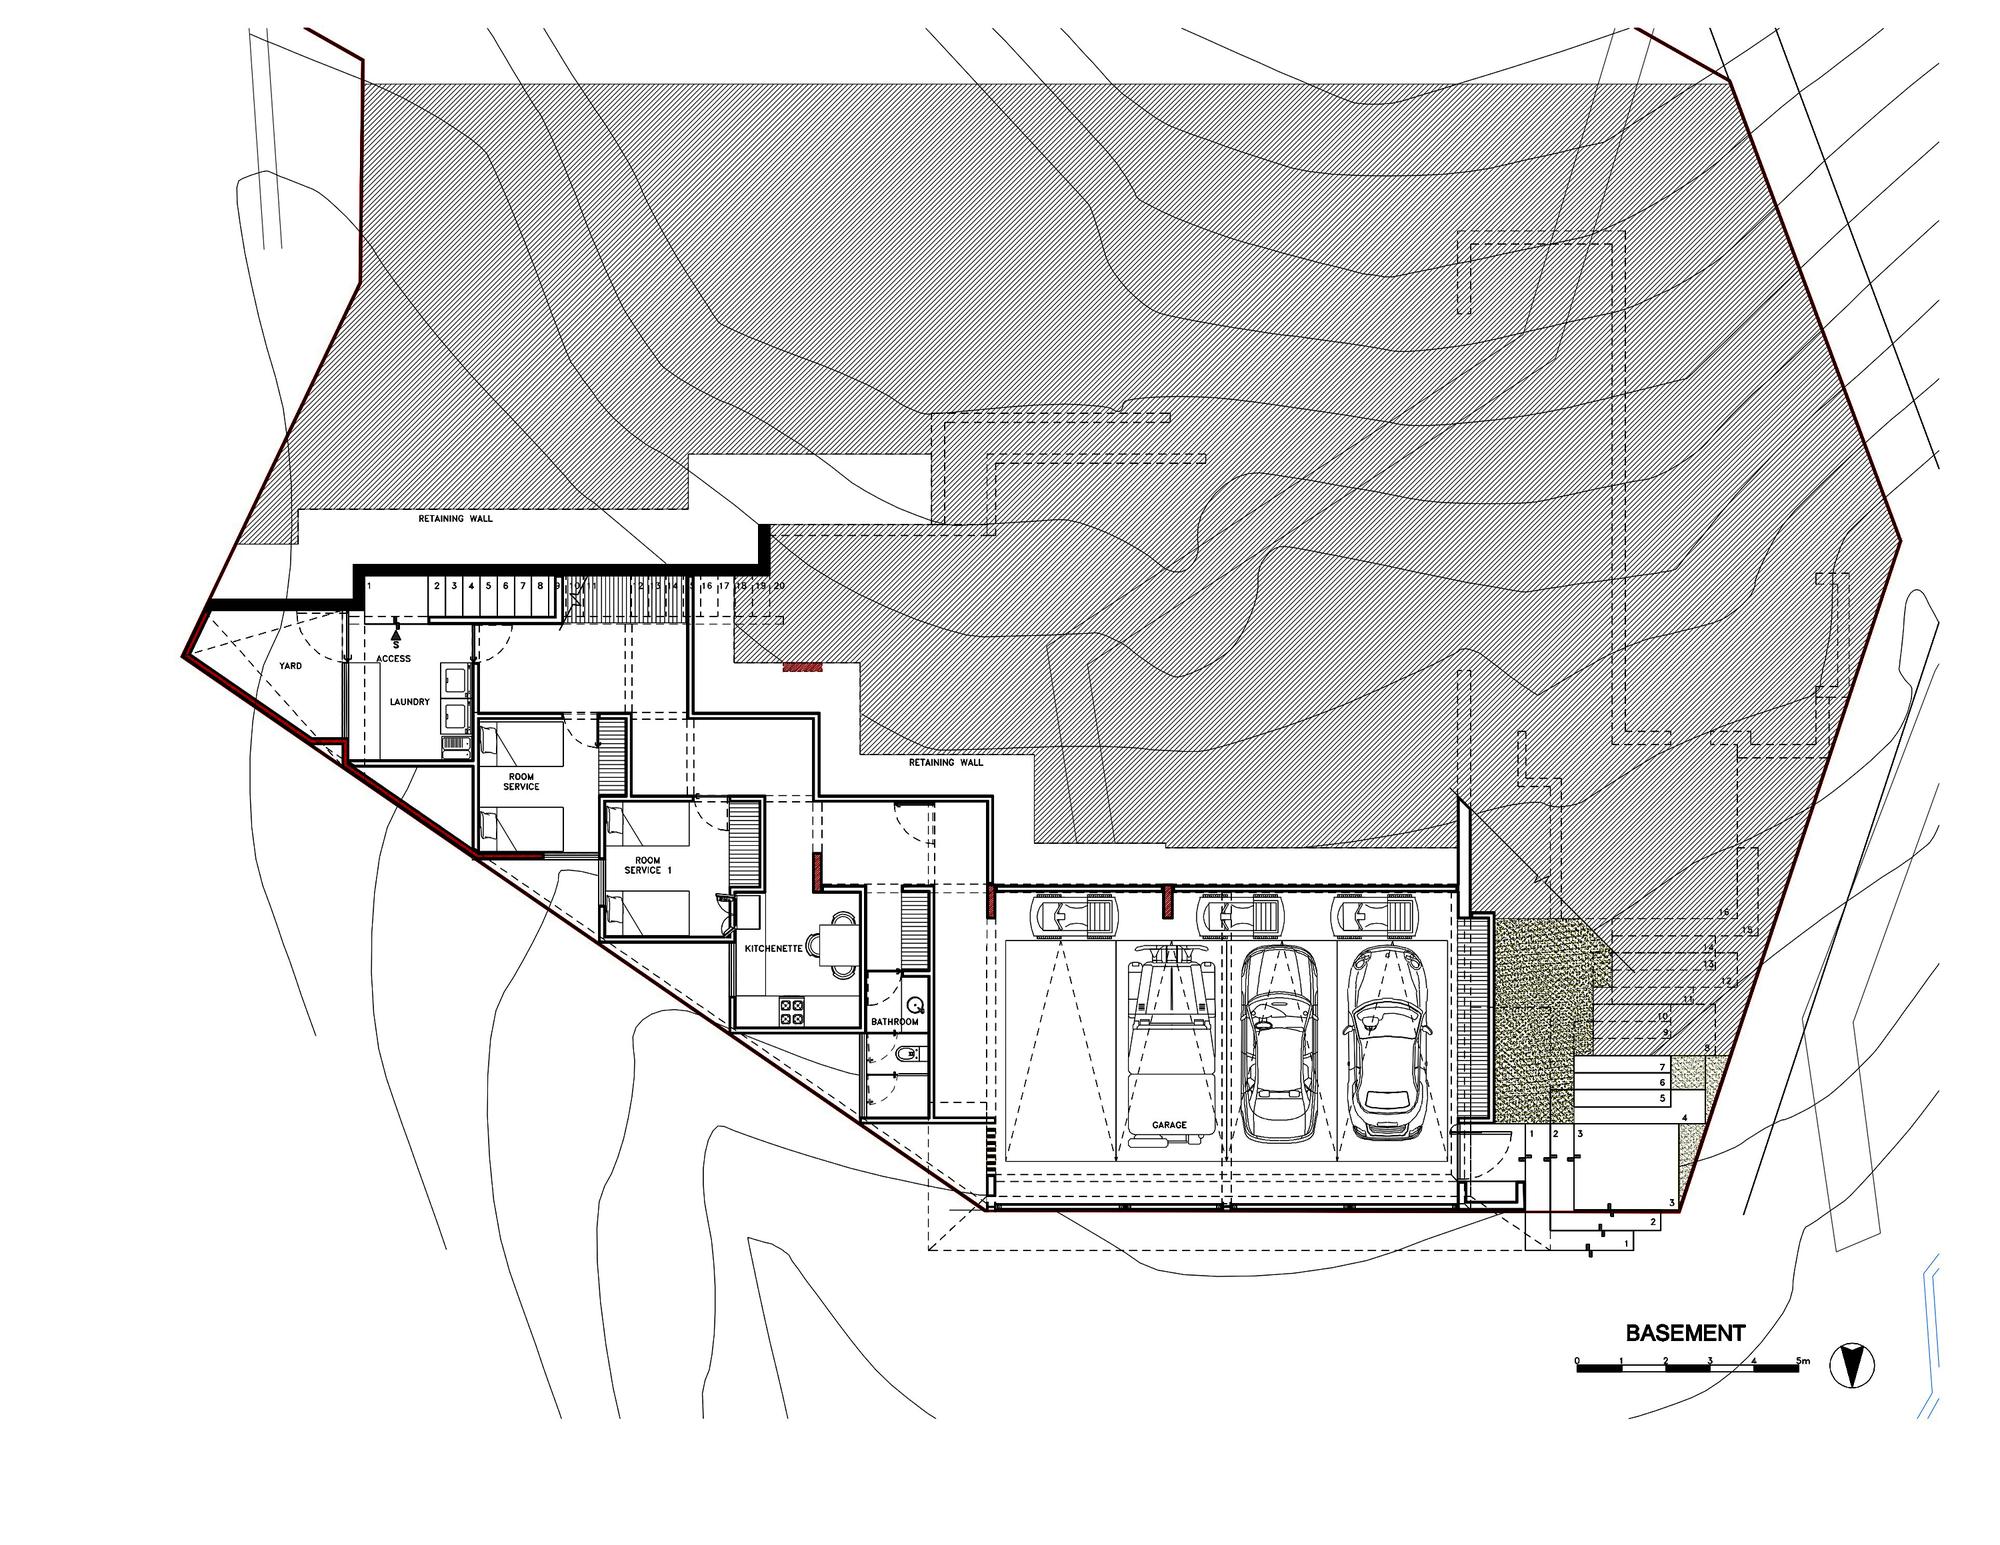 530eba5cc07a80ce8b00011e_house-maza-chk-arquitectura_basement